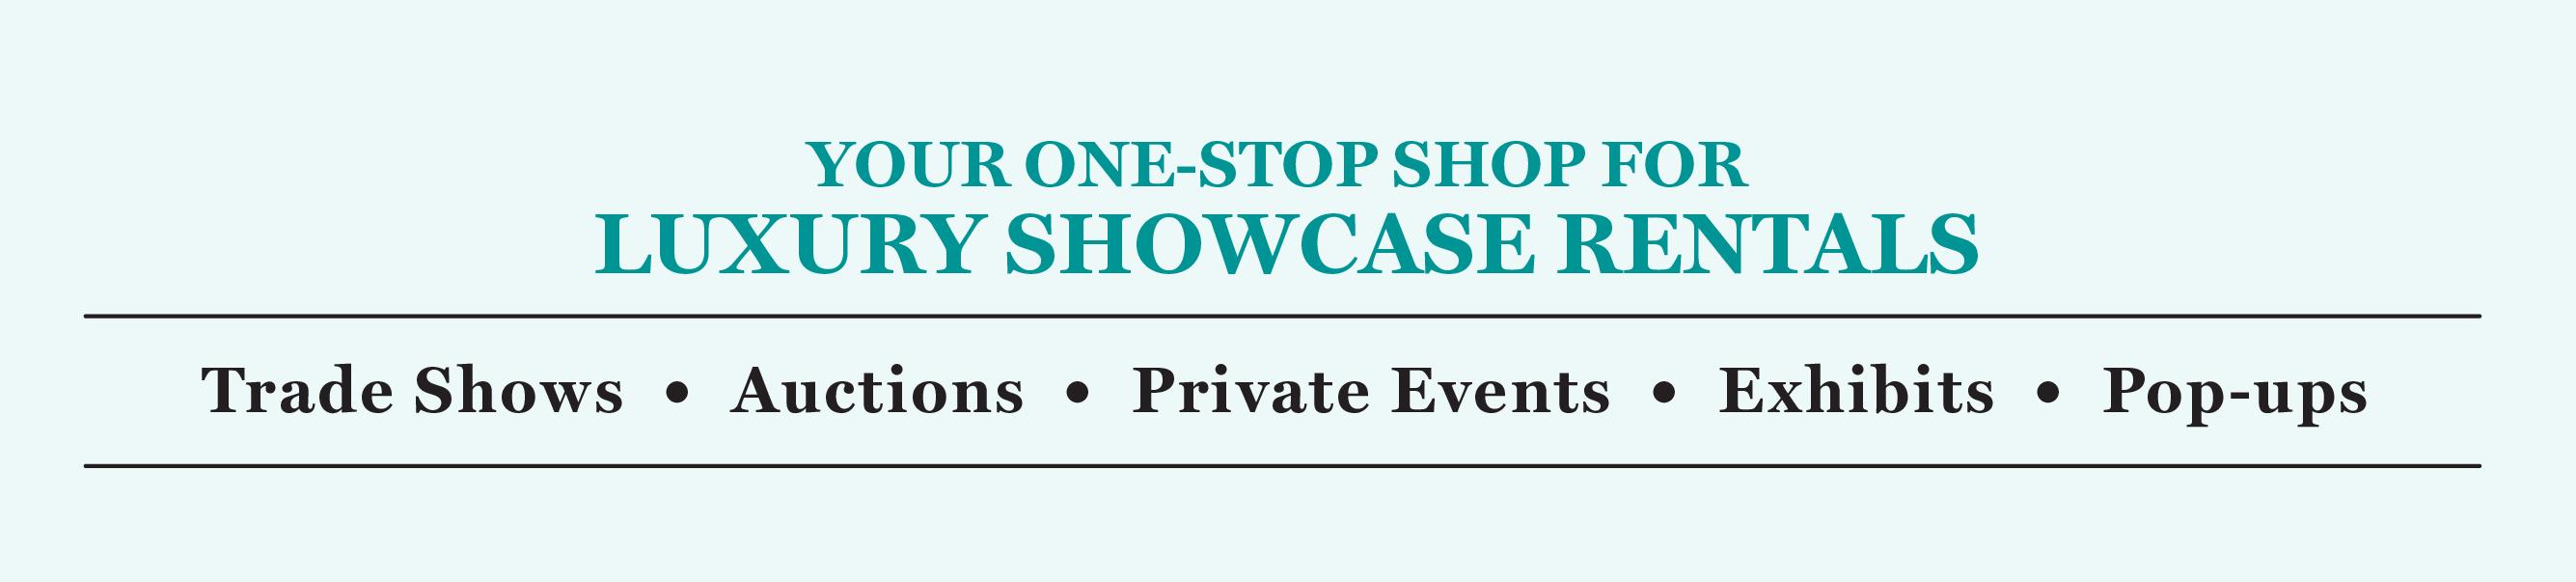 showcase, showcases, display case, display cases, trade show, trade shows, trade show rentals, tradeshow, exhibit, exhibit rentals, auction, auction rentals, event, event rentals, events rentals, las vegas, new york